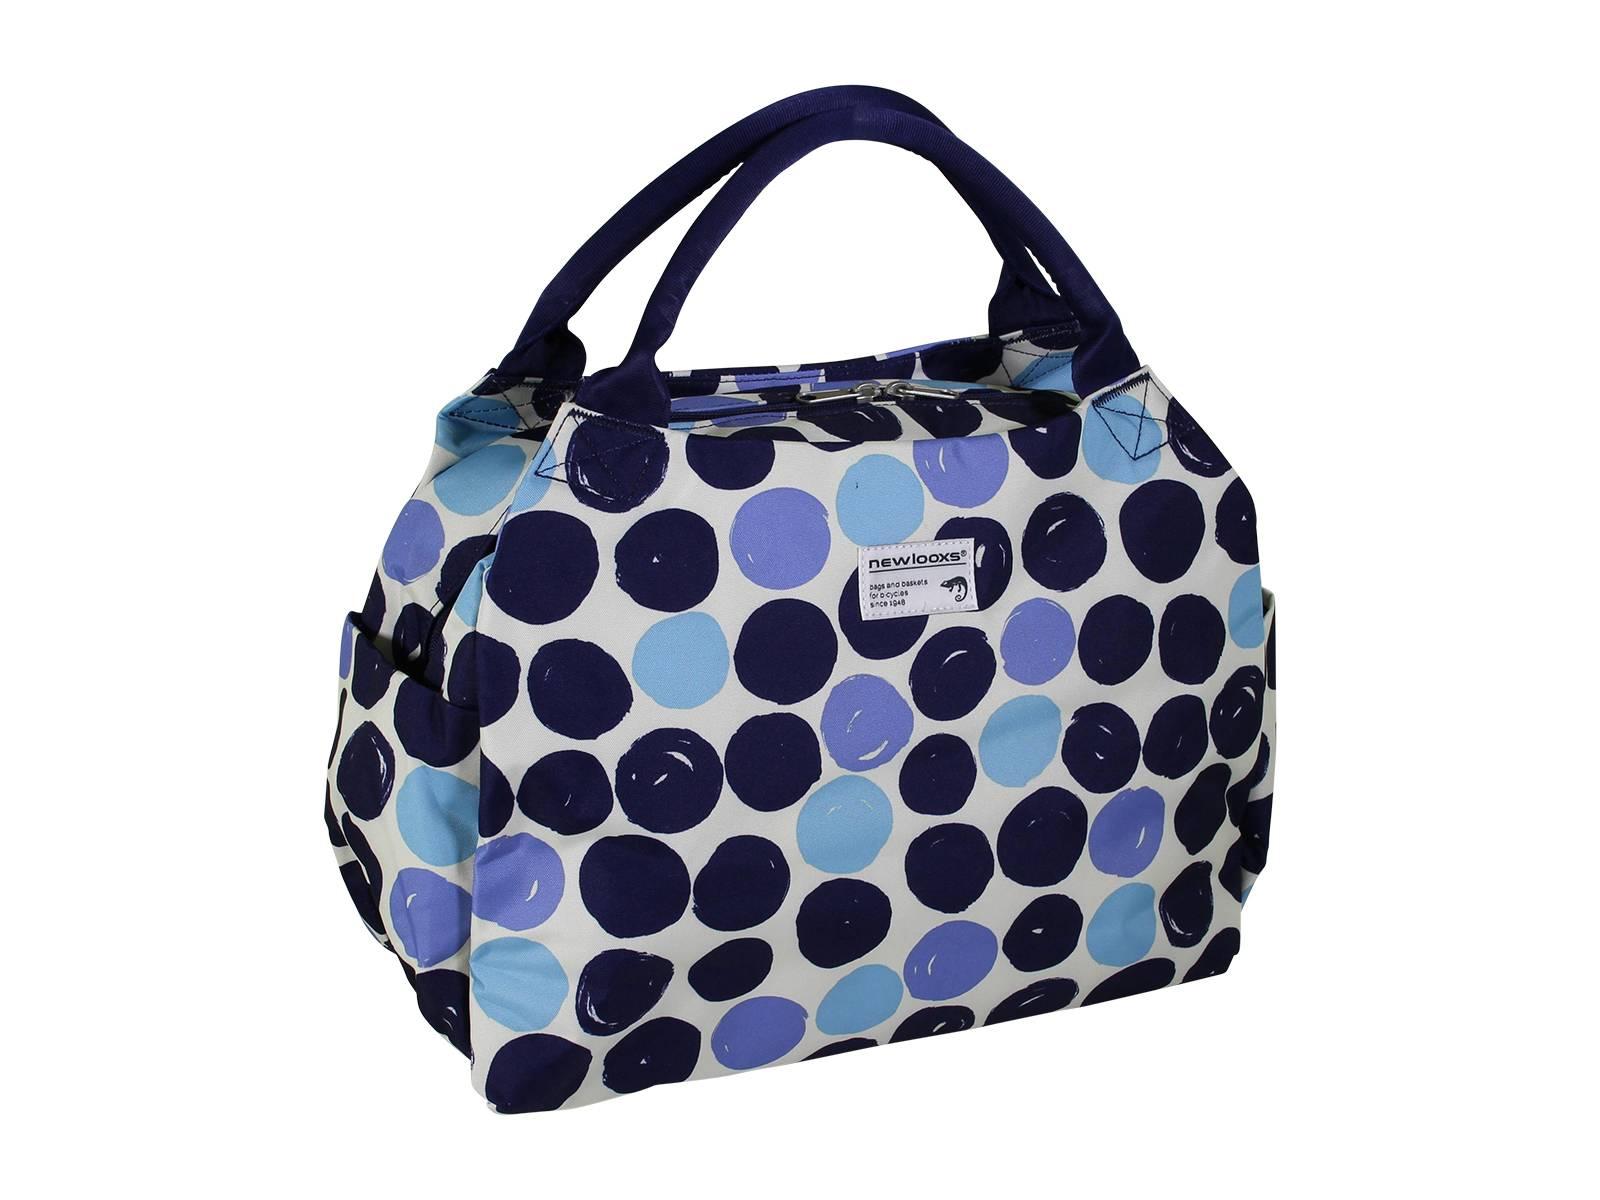 new looxs fahrradtasche gep cktr ger tosca dots blau. Black Bedroom Furniture Sets. Home Design Ideas